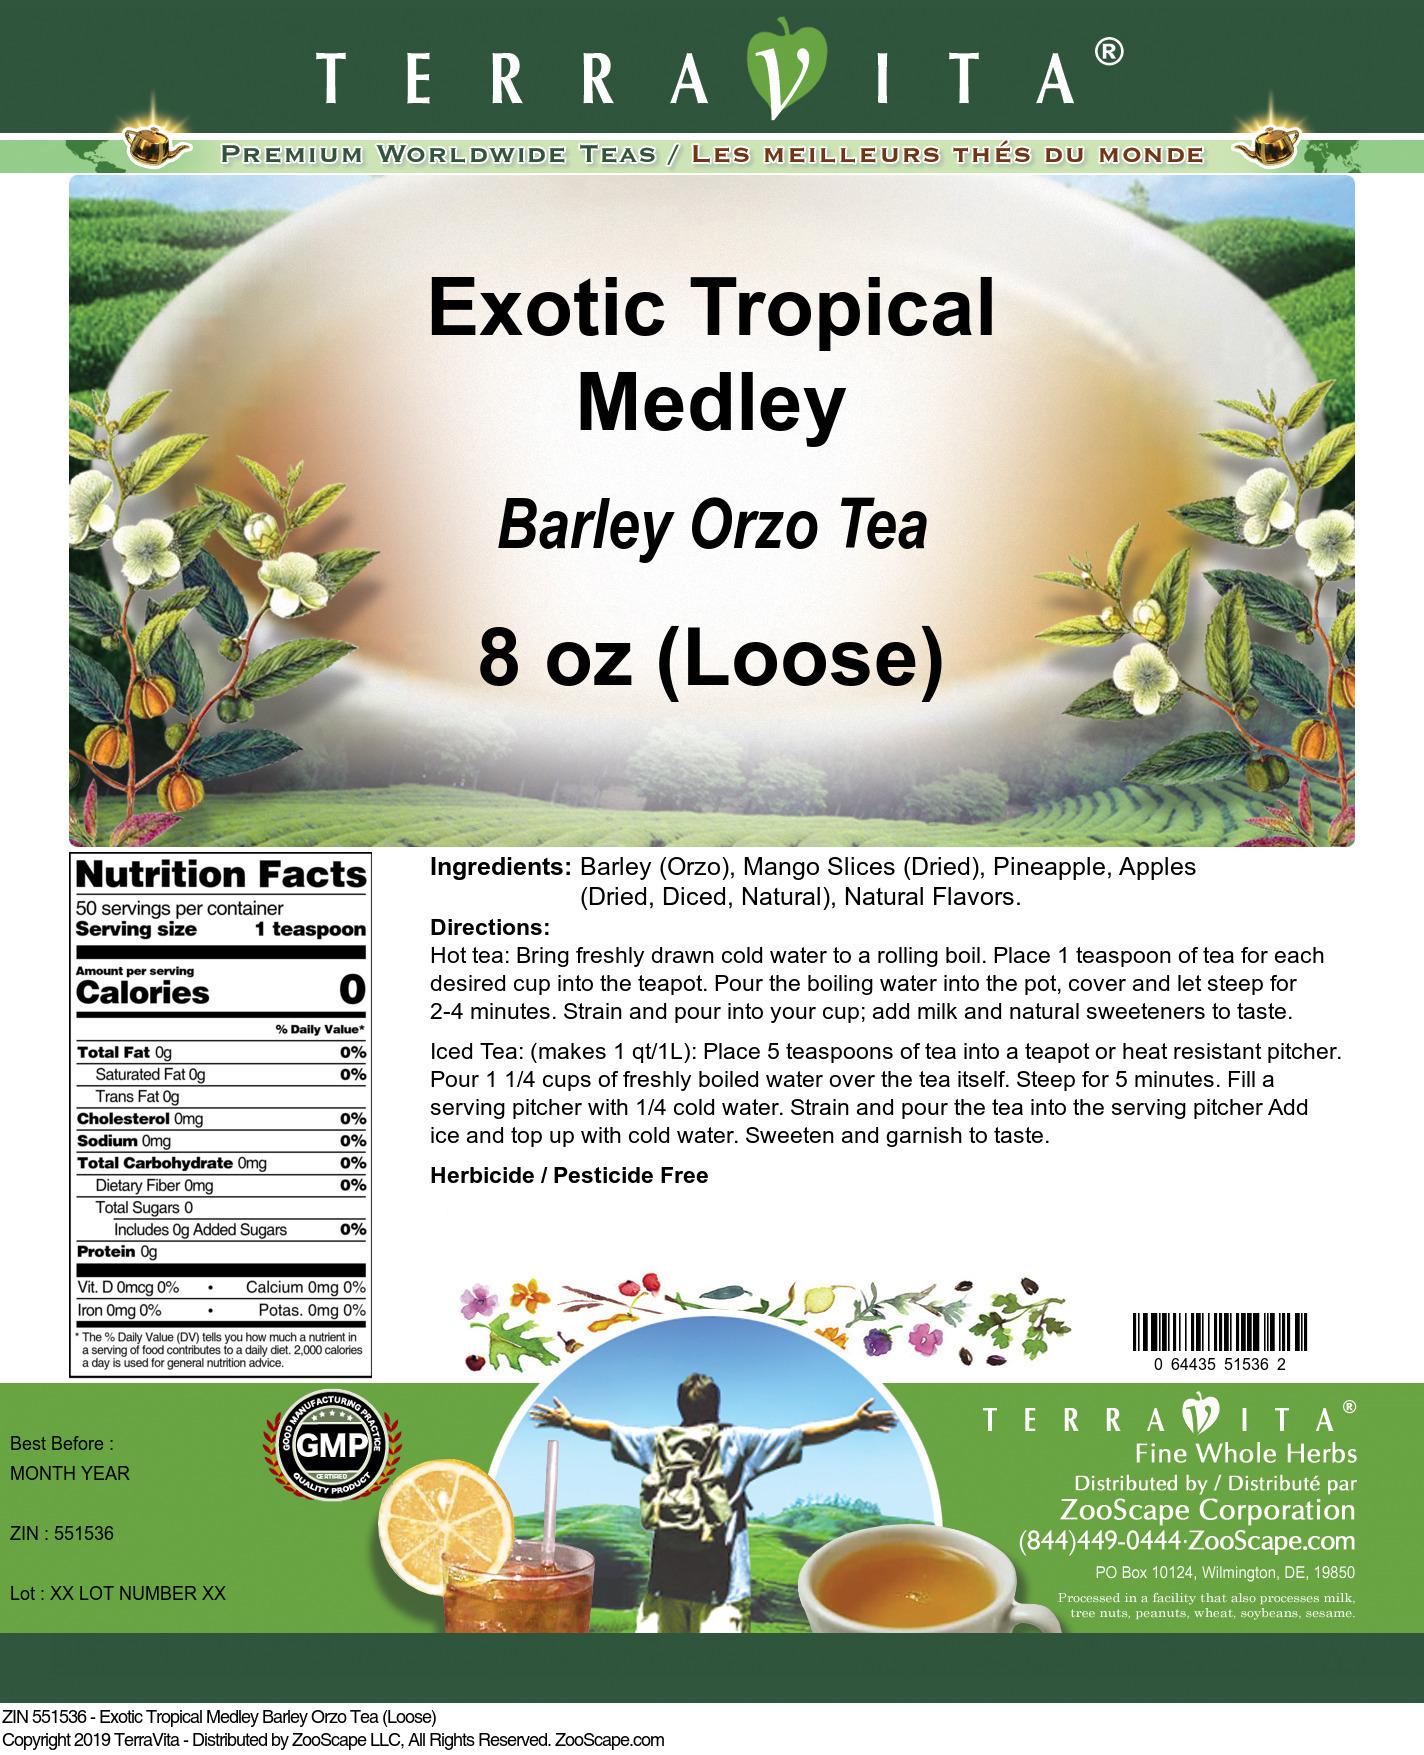 Exotic Tropical Medley Barley Orzo Tea (Loose)